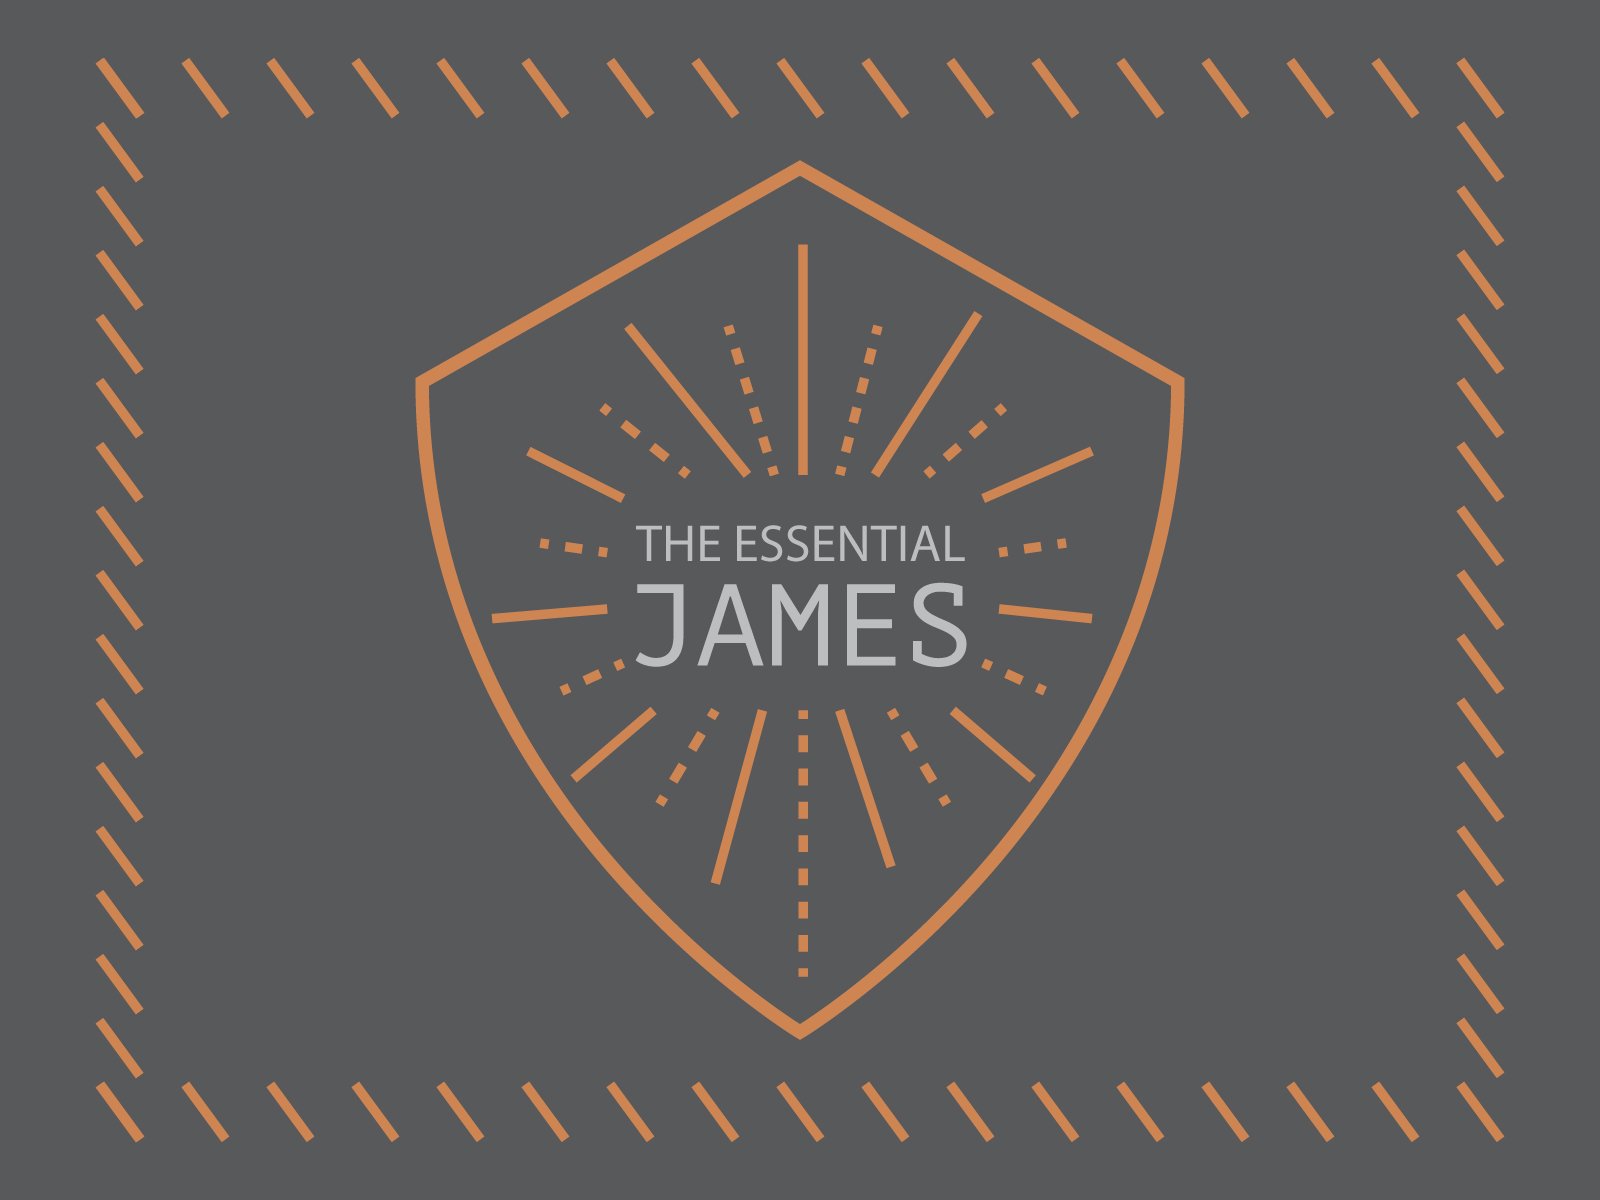 The-Essential-James-Main-1.jpg